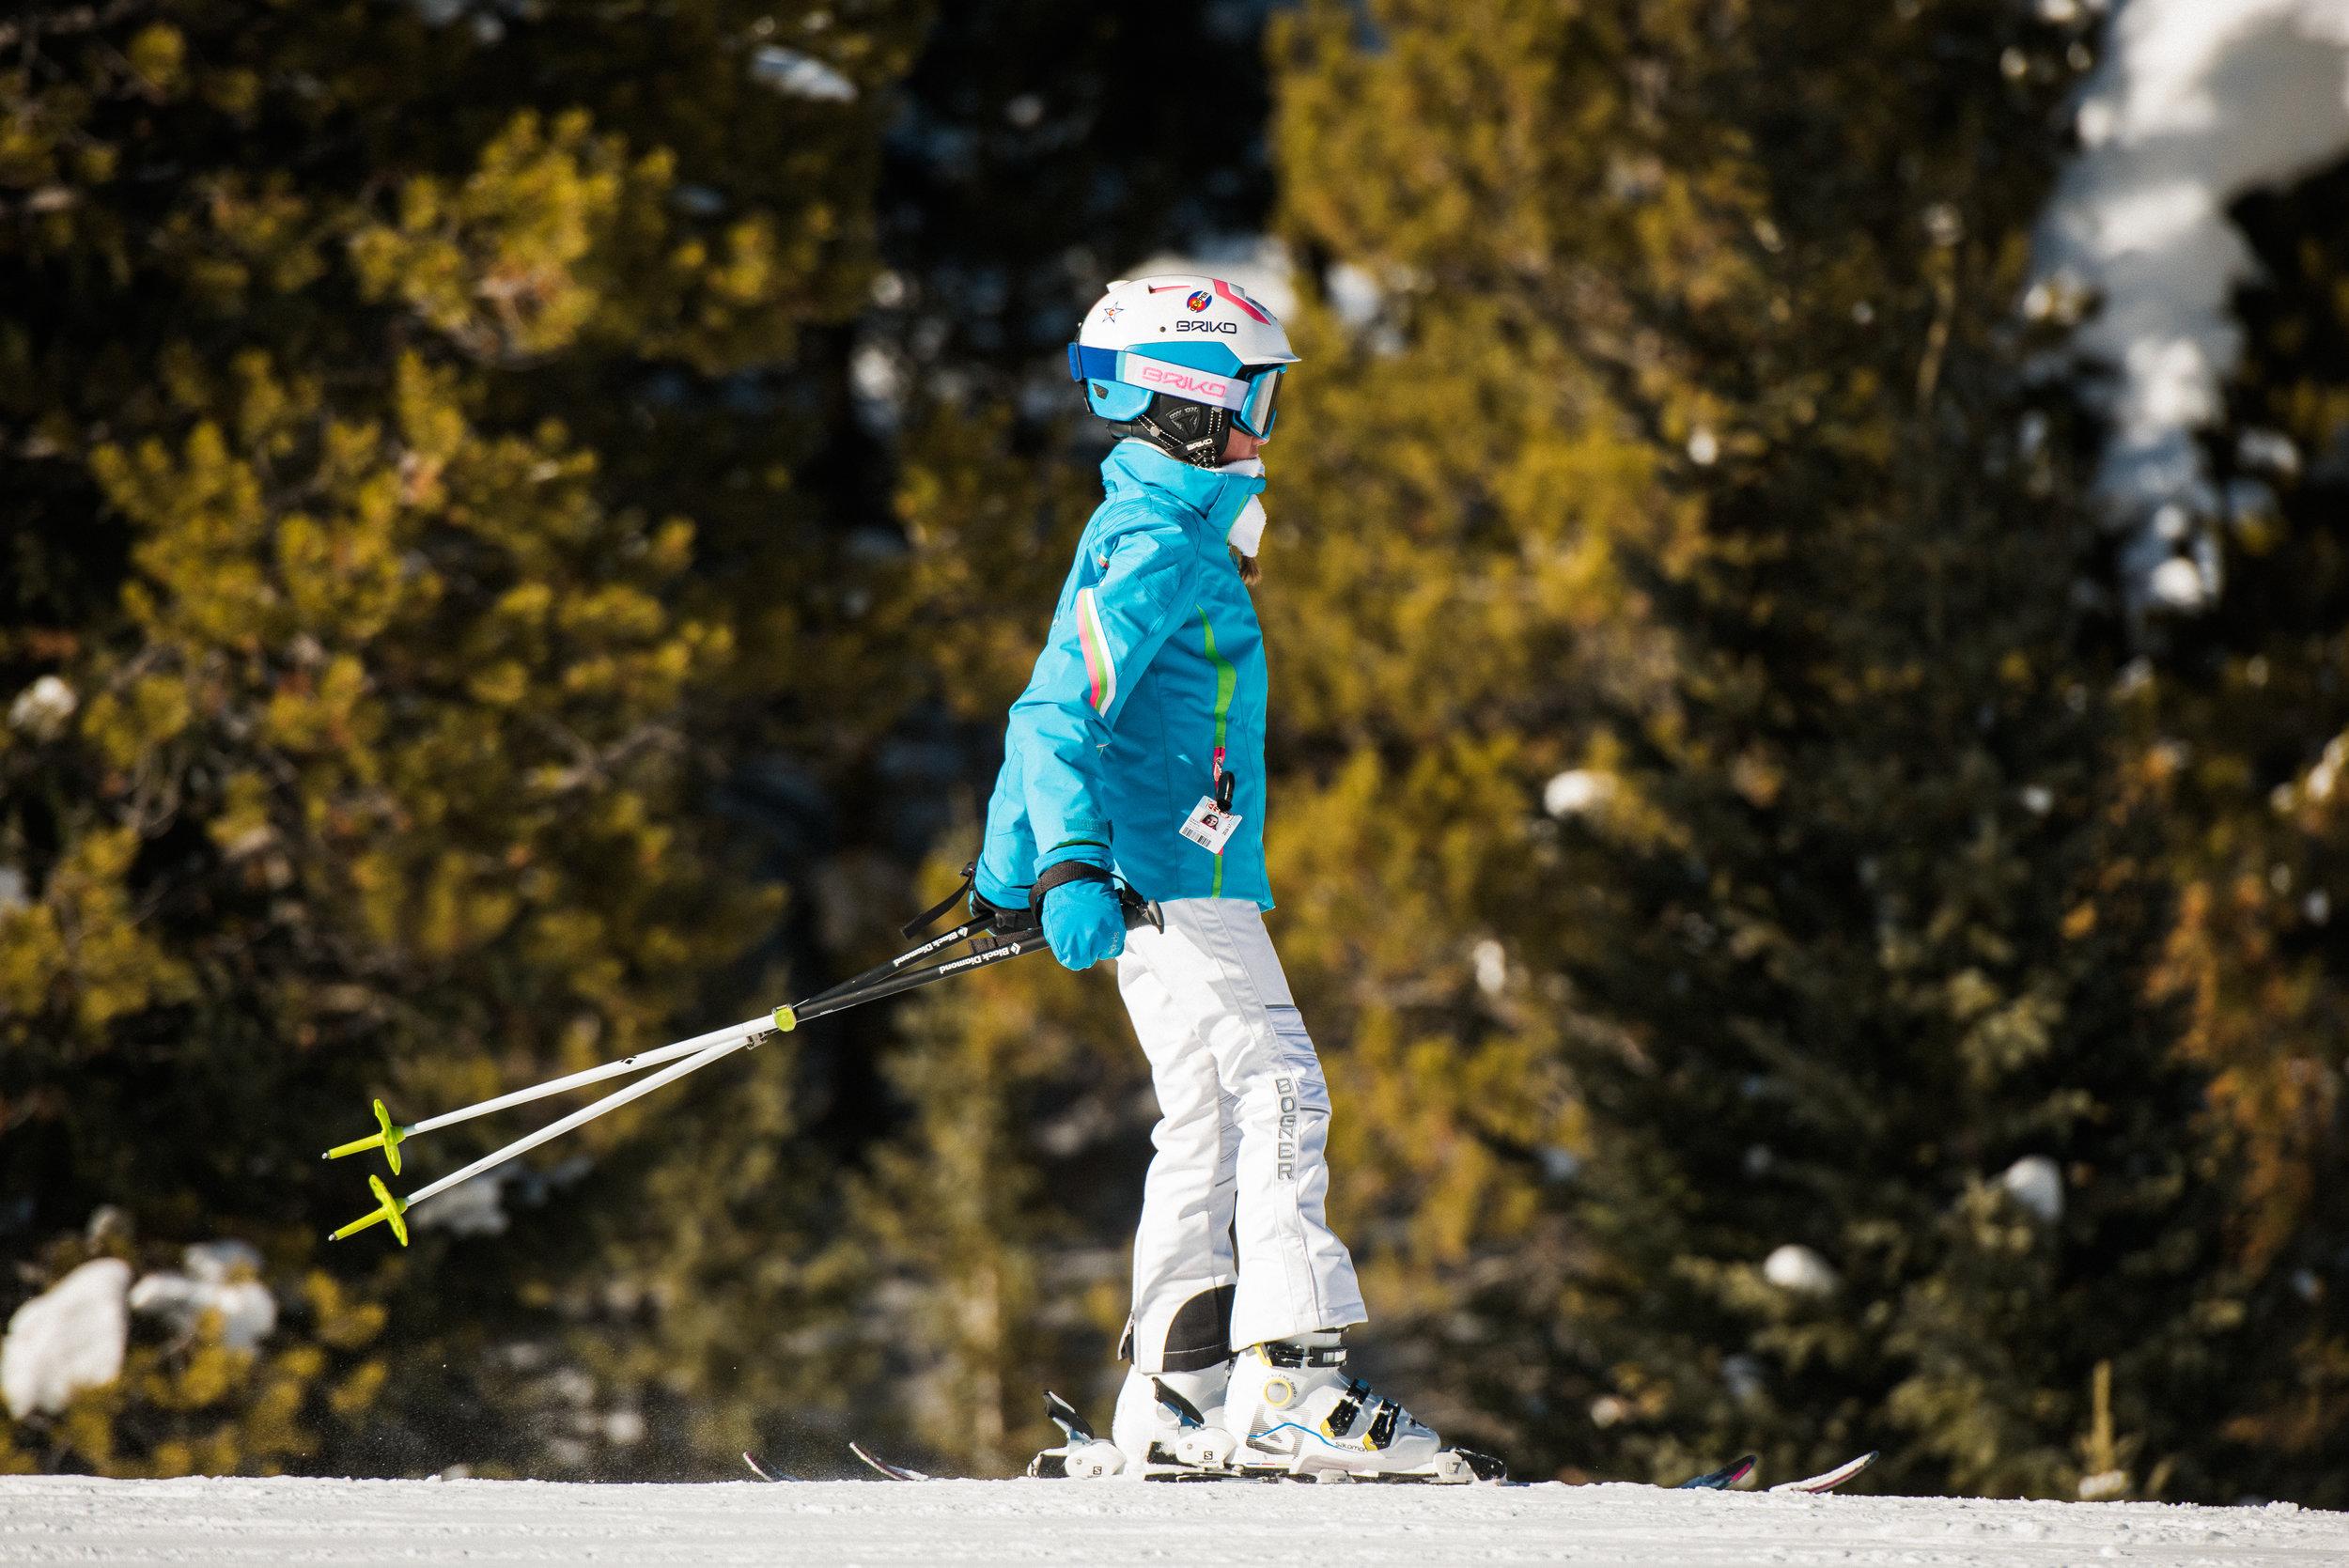 TaraShupe_Outdoor_Photographer_Loweprobags_Colorado_Copper_Mountains_Ski_36.jpg